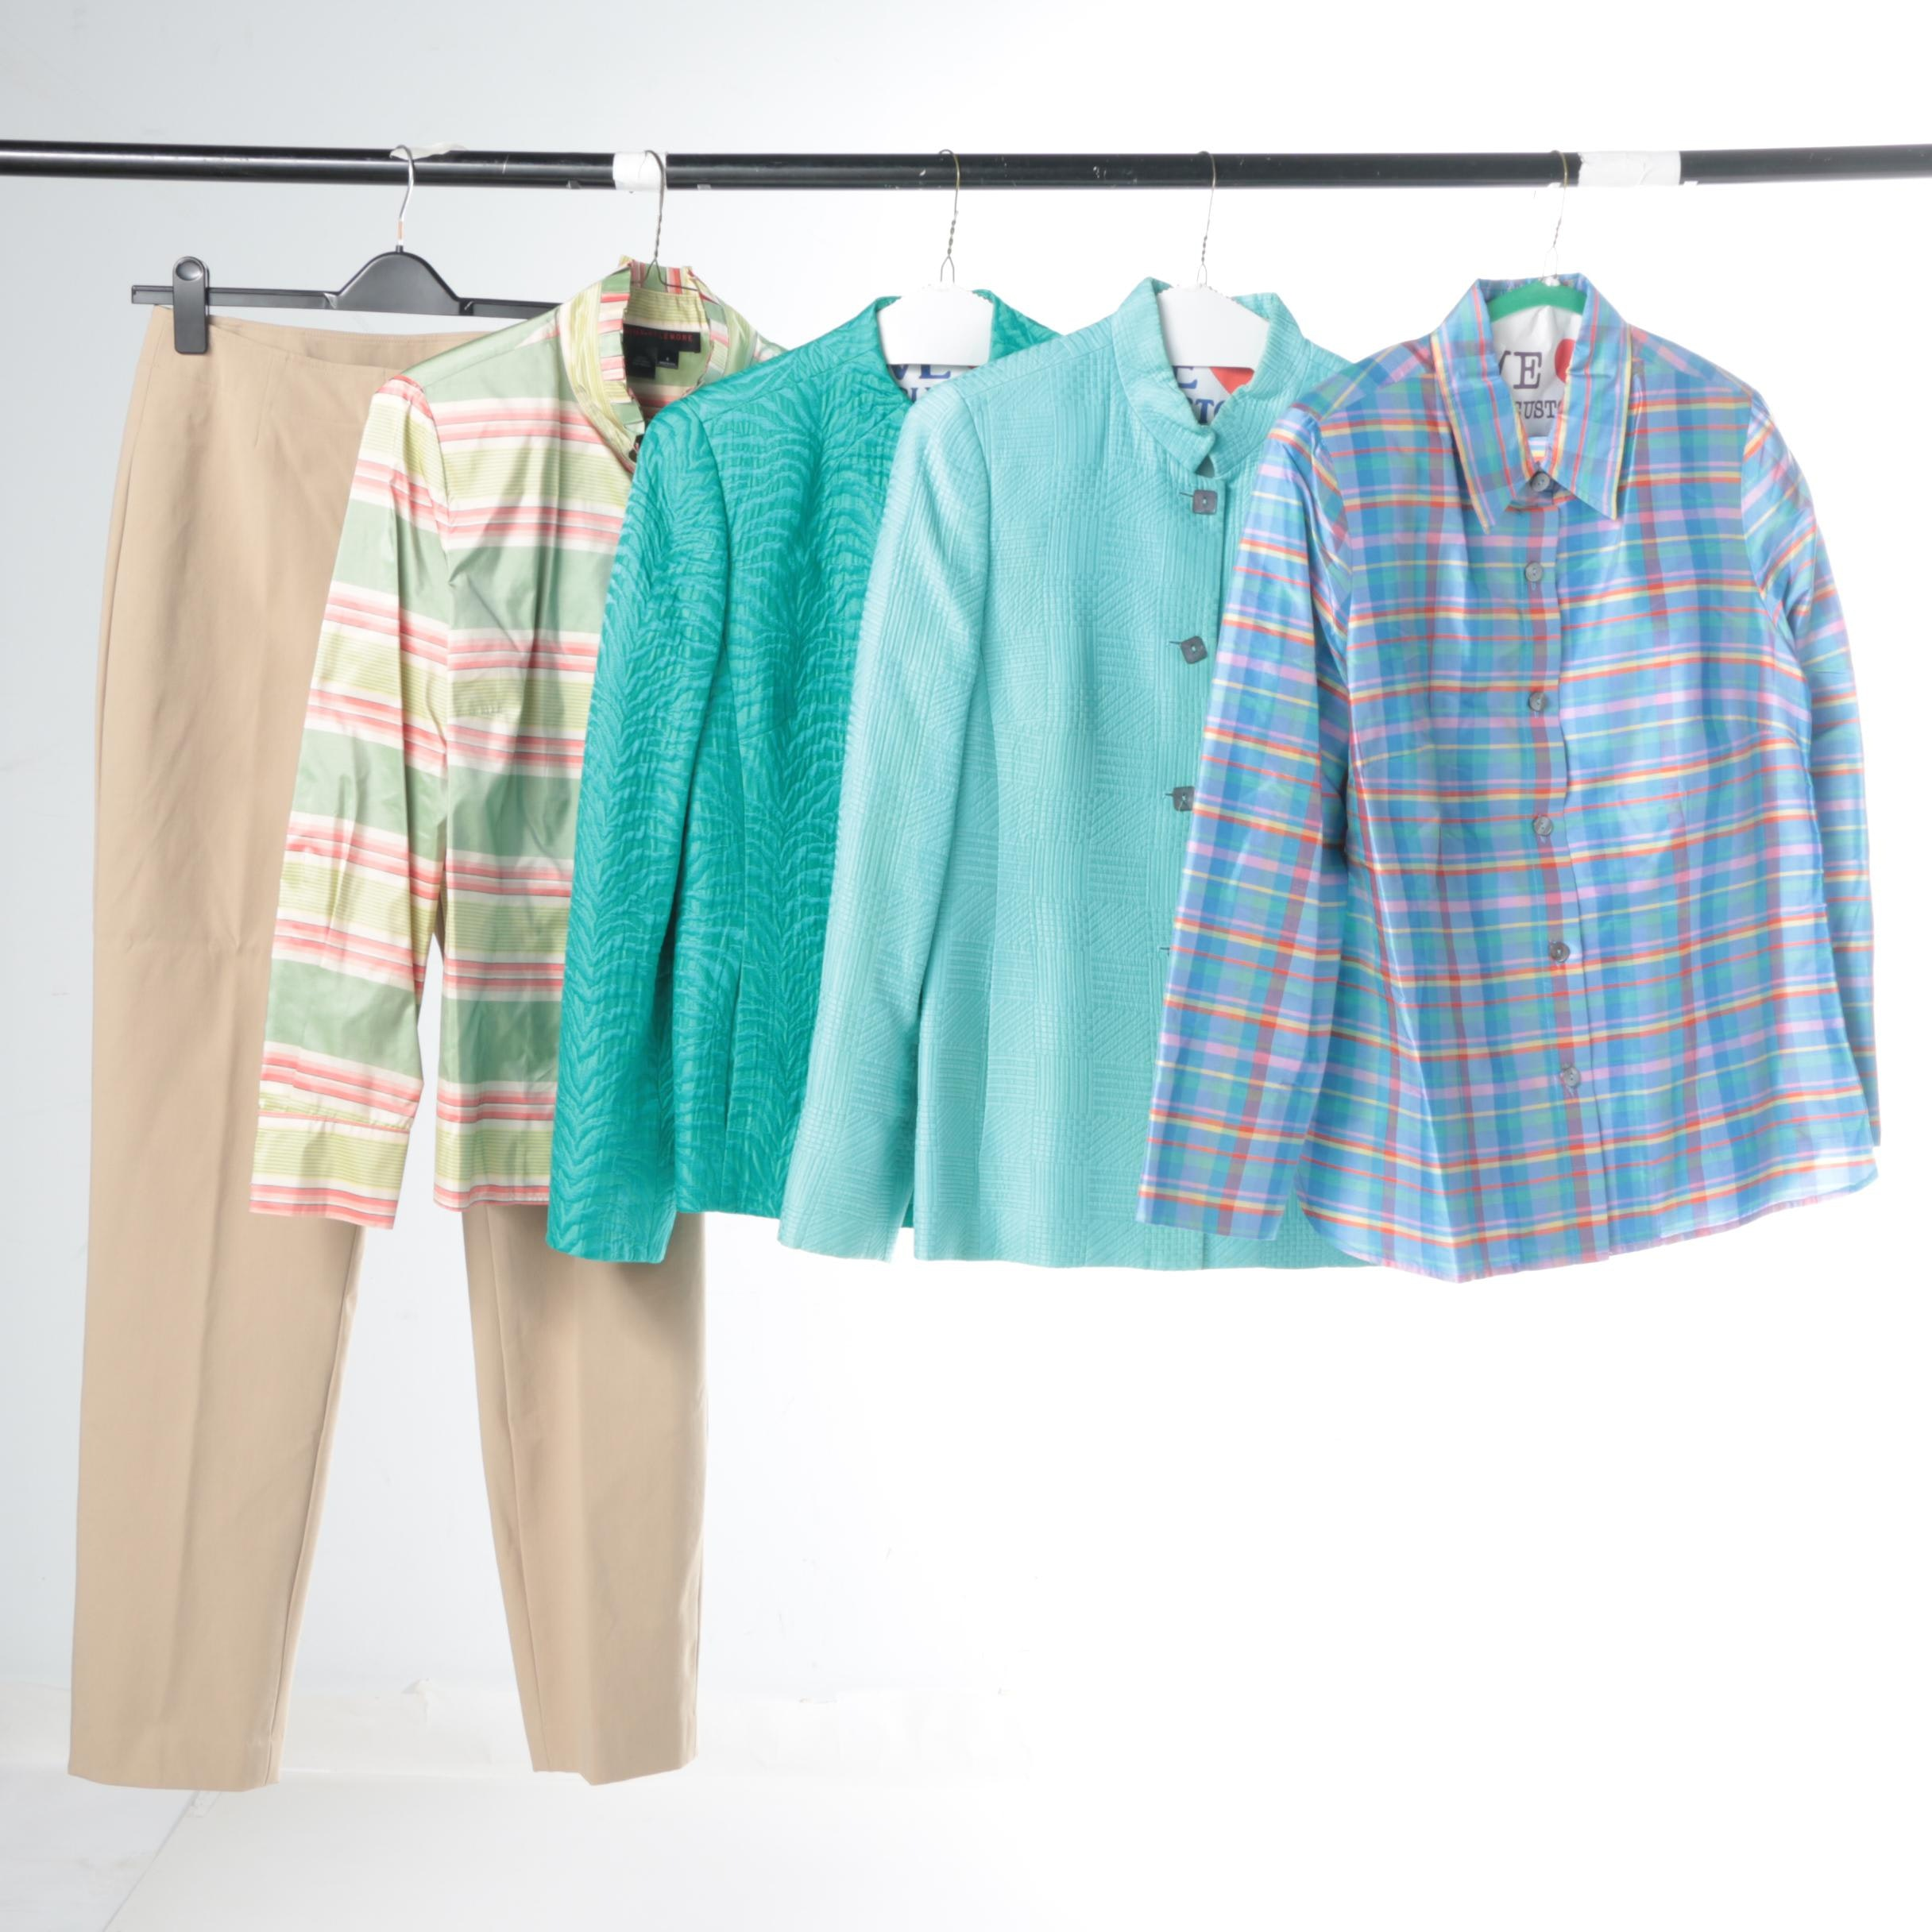 Women's Nina McLemore Button-Ups and Blazers